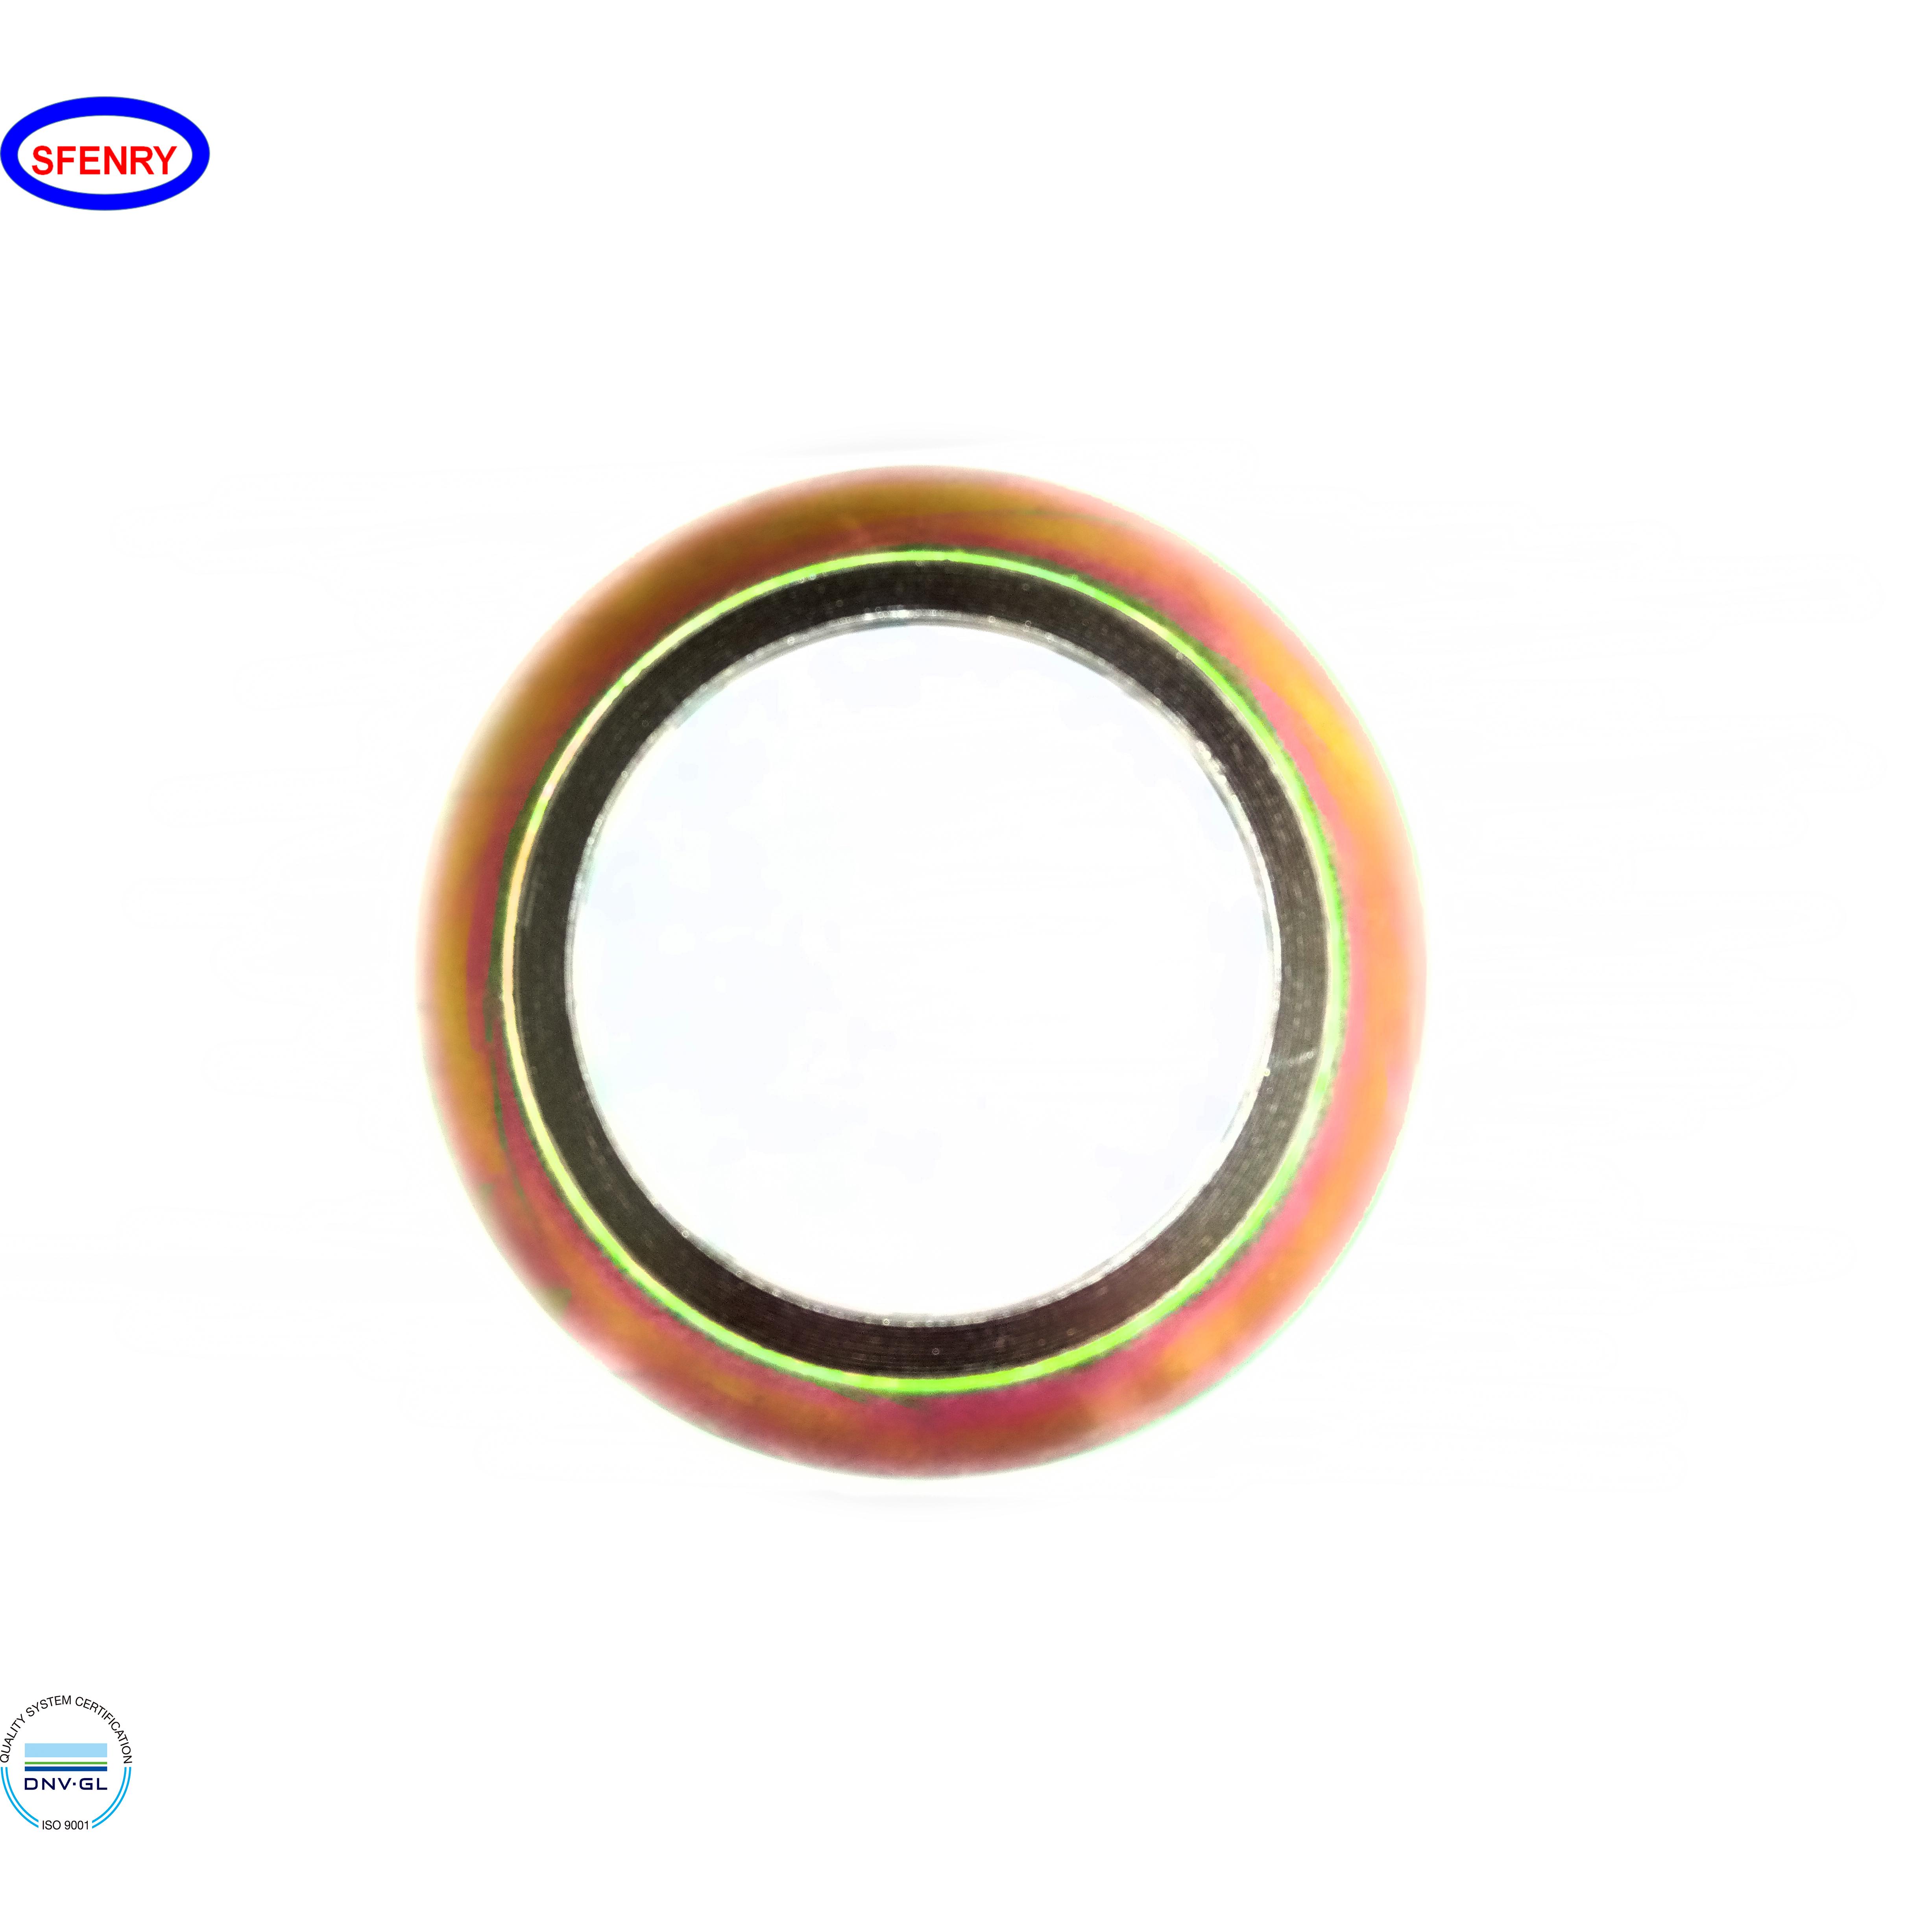 Best Price 150 Lb Ss316 Ss316l Graphite Filler Spiral Wound Gasket - Buy  150lb Ss304 Spiral Wound Gasket,316 Spiral Wound Gasket Price,316 Ss Gasket